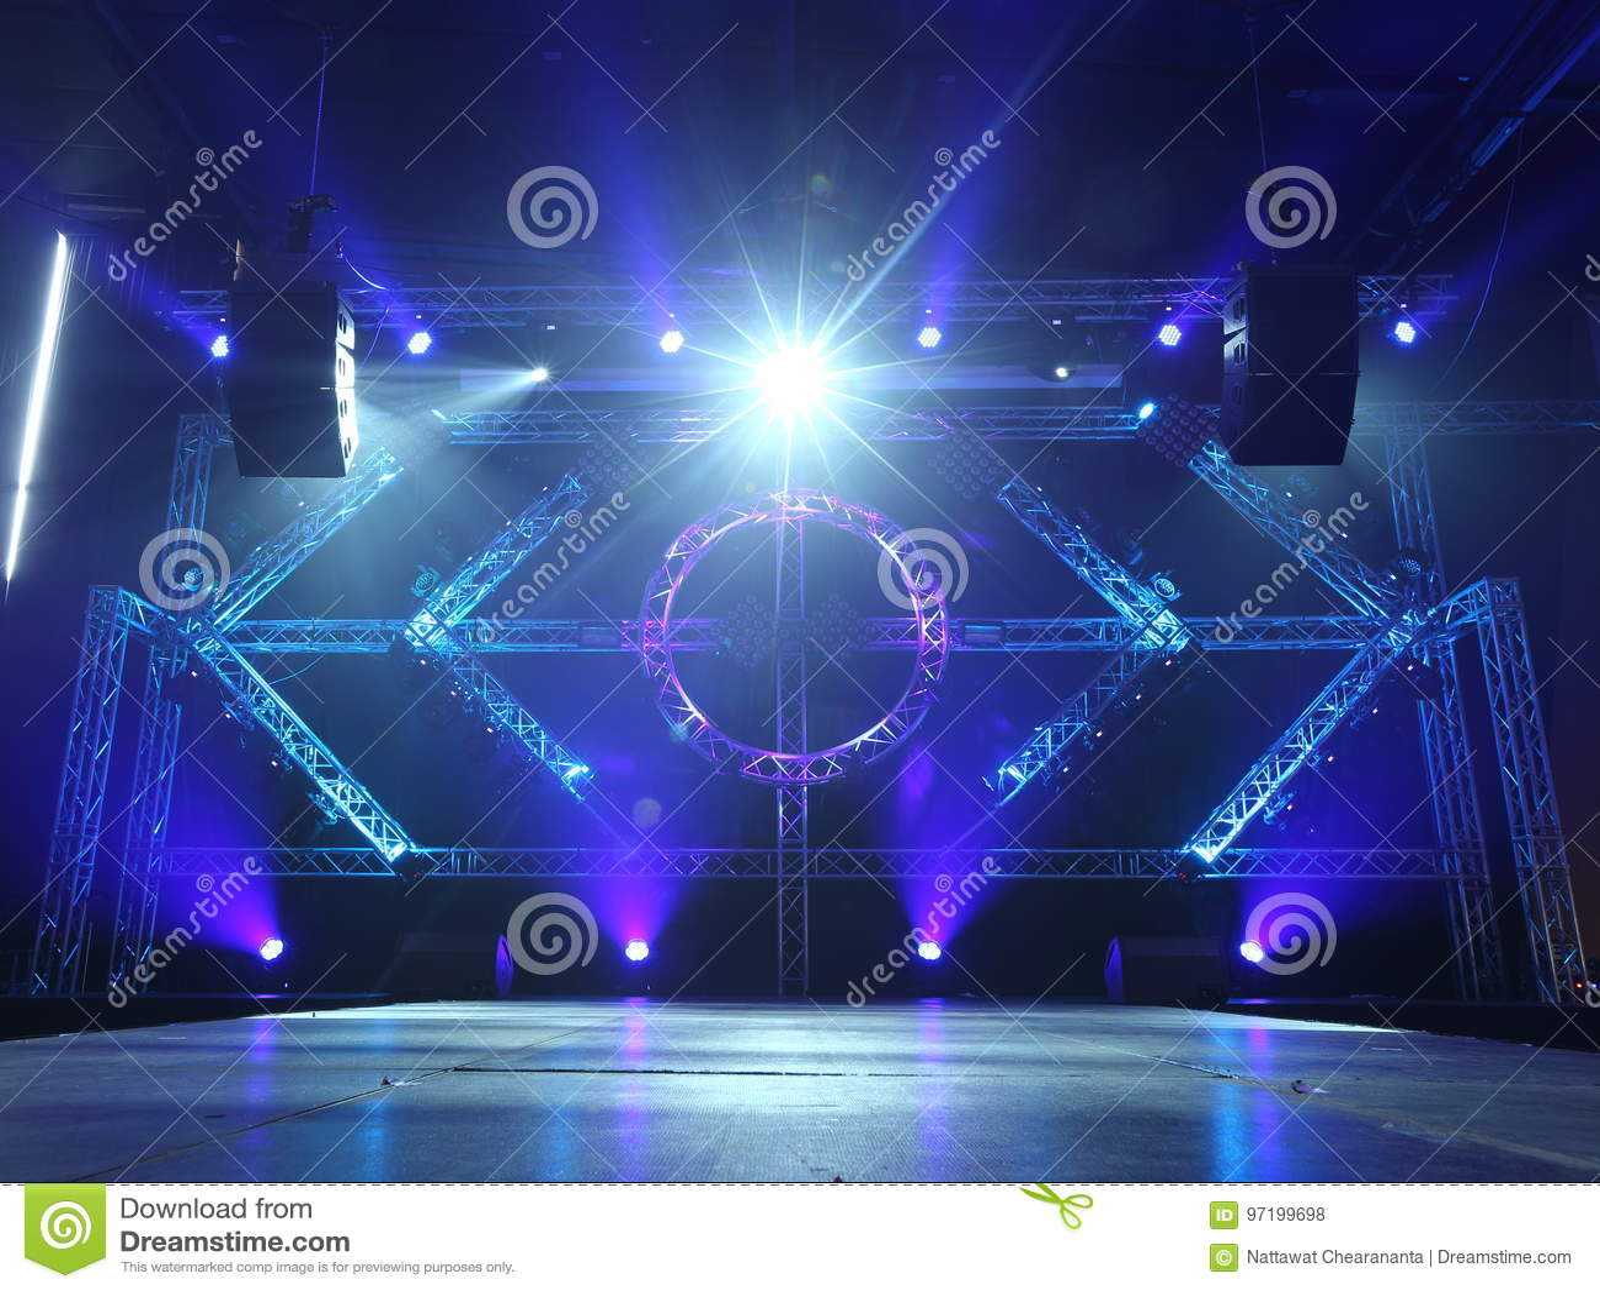 https www dreamstime com stock photo empty runway fashion show catwalk moving beam lighting along walk way background stage ramp image97199698